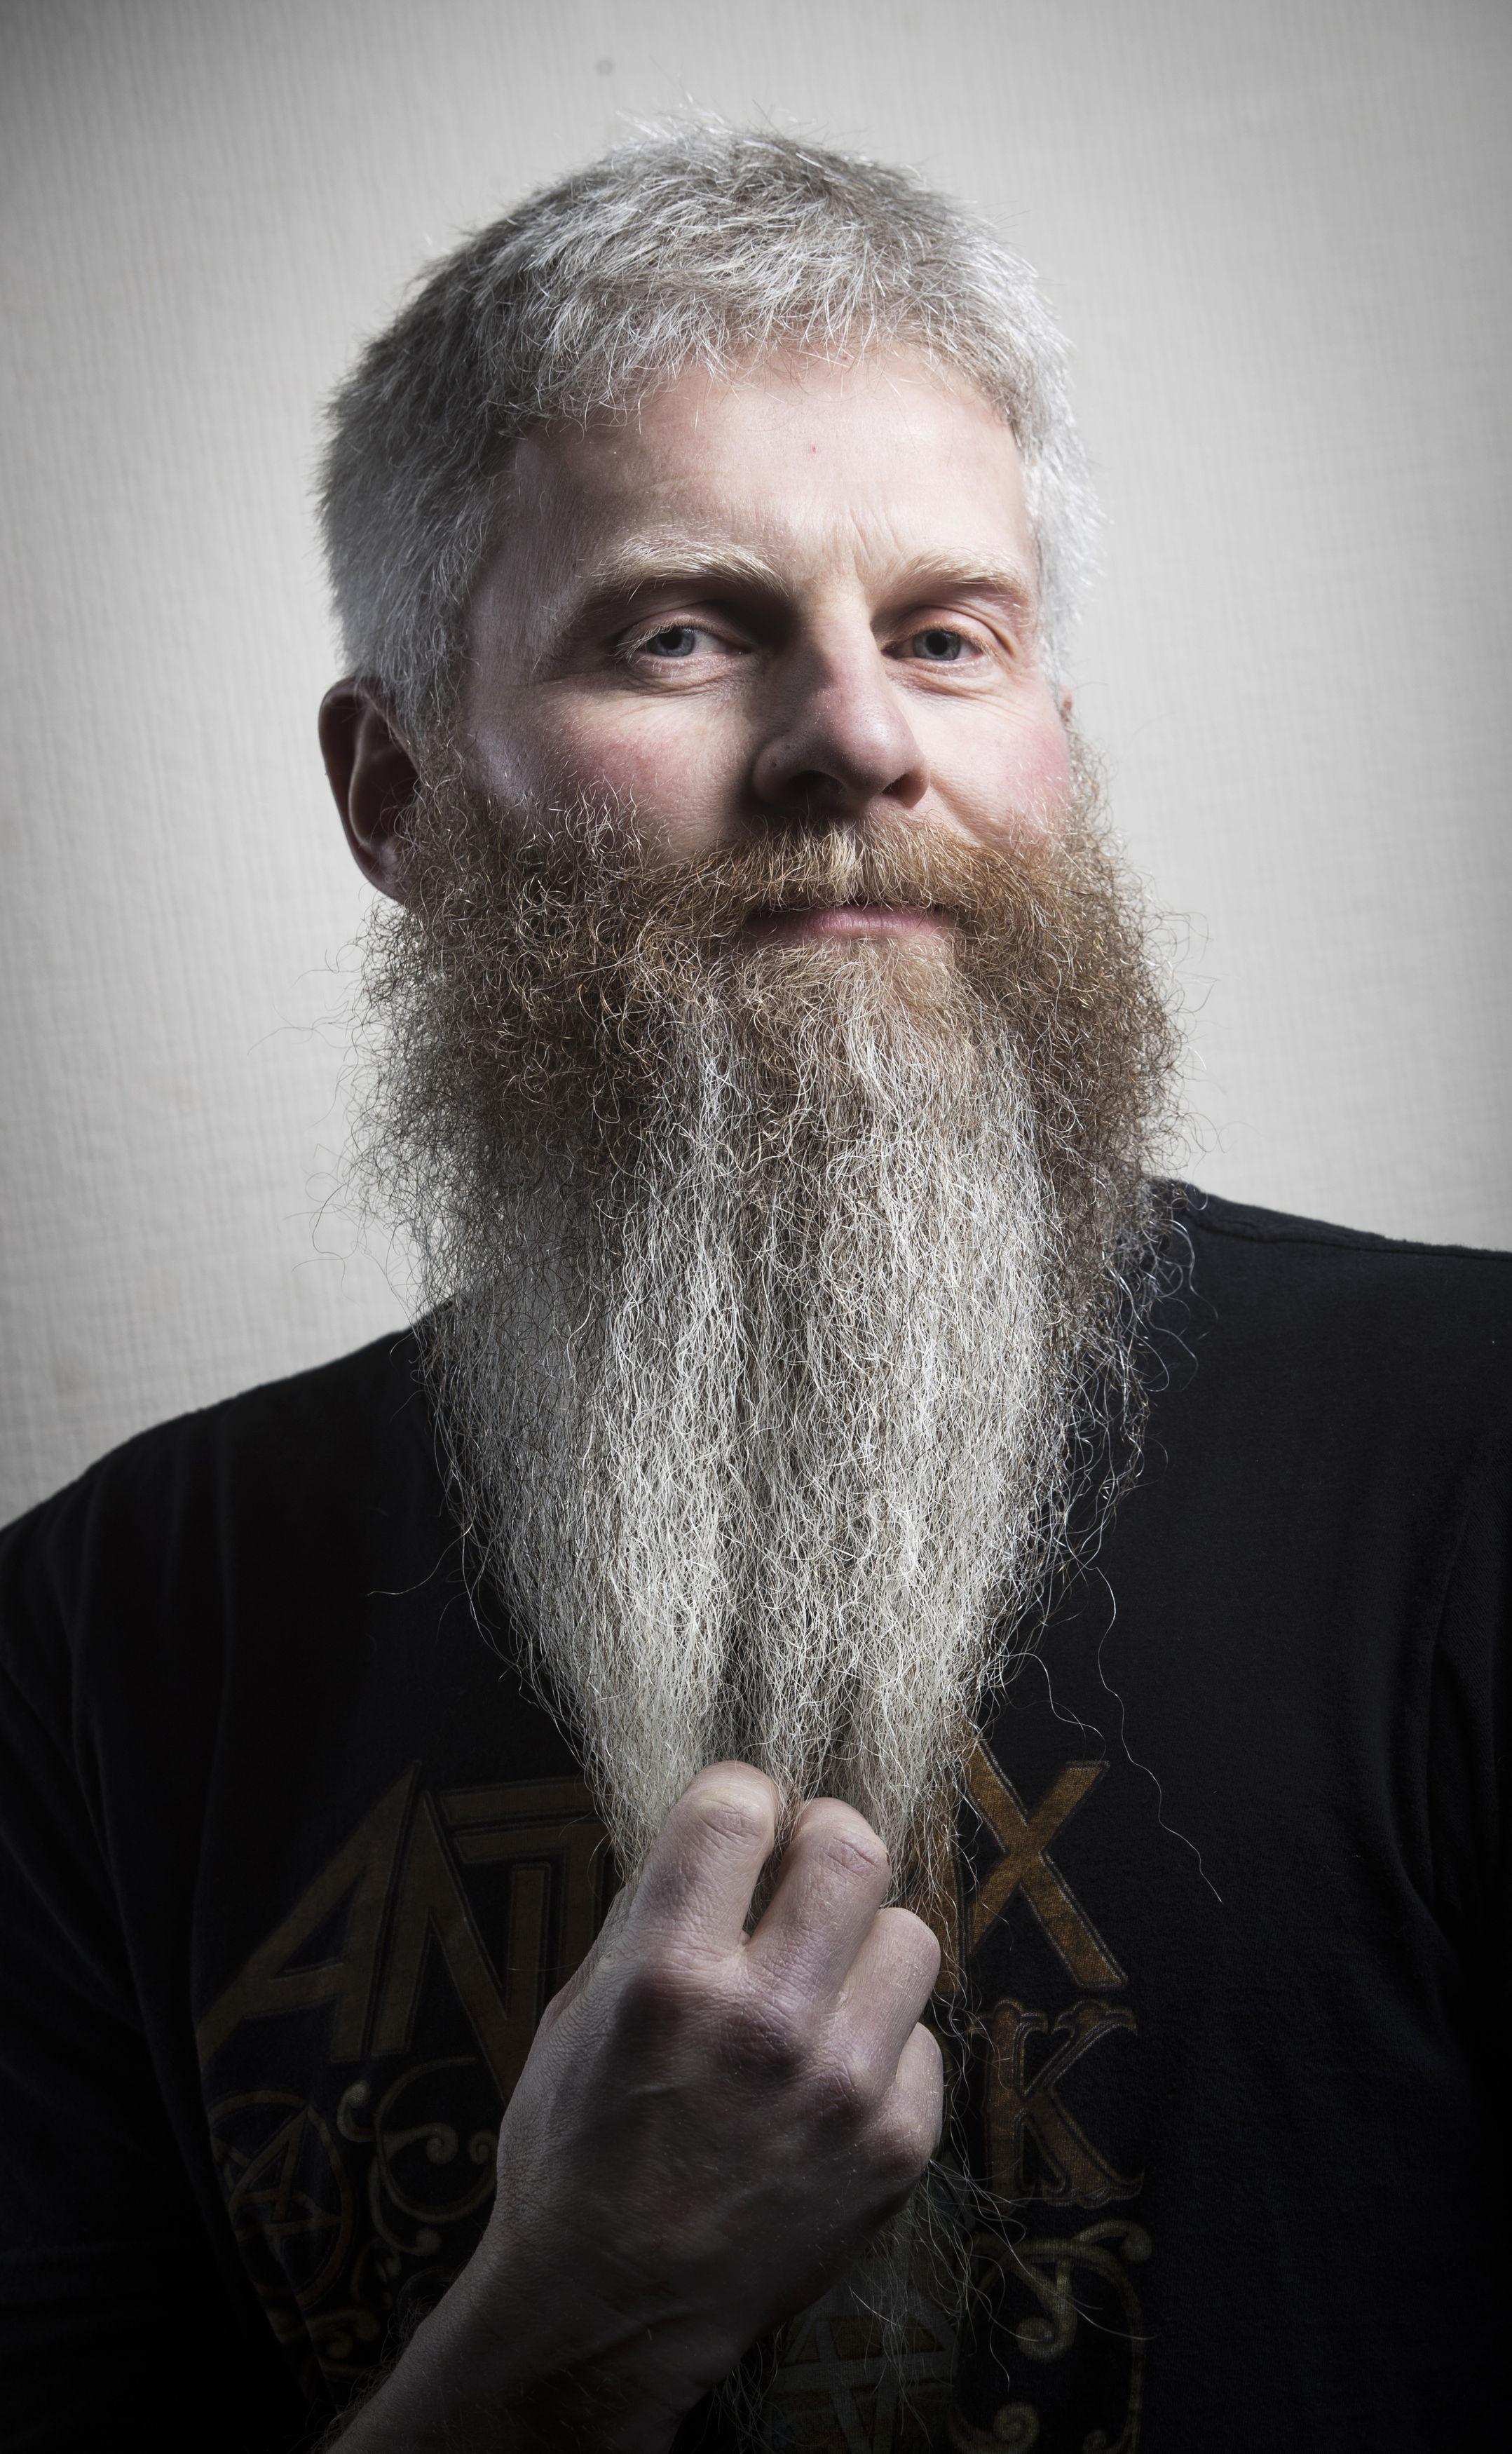 A man stroking his beard